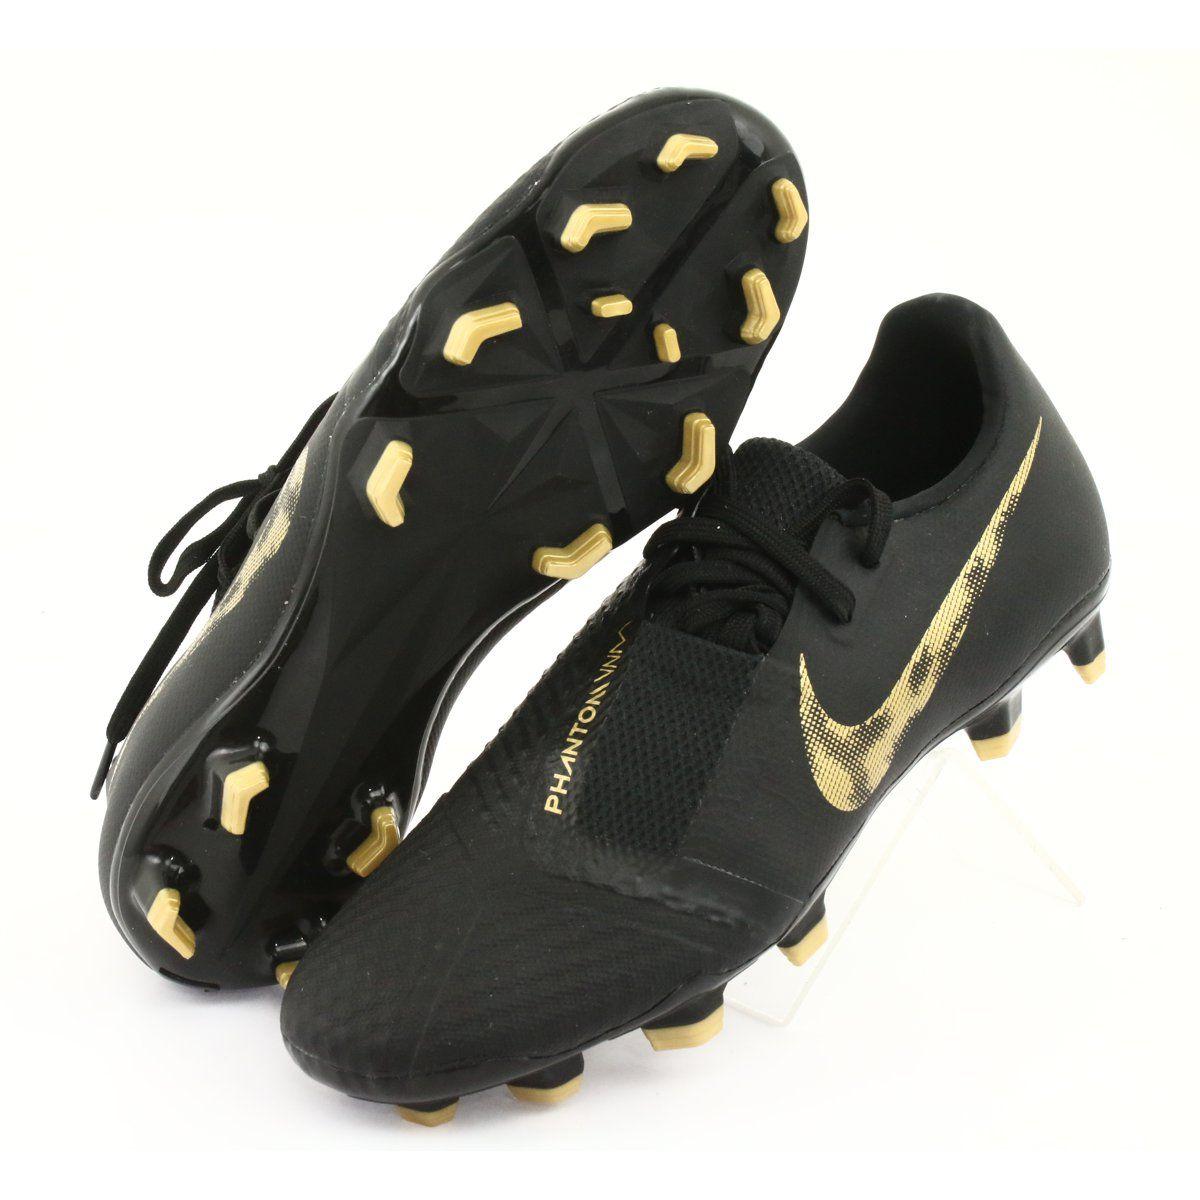 Buty Pilkarskie Nike Phantom Venom Academy Fg M Ao0566 077 Czarne Nike Sport Shoes Shoes